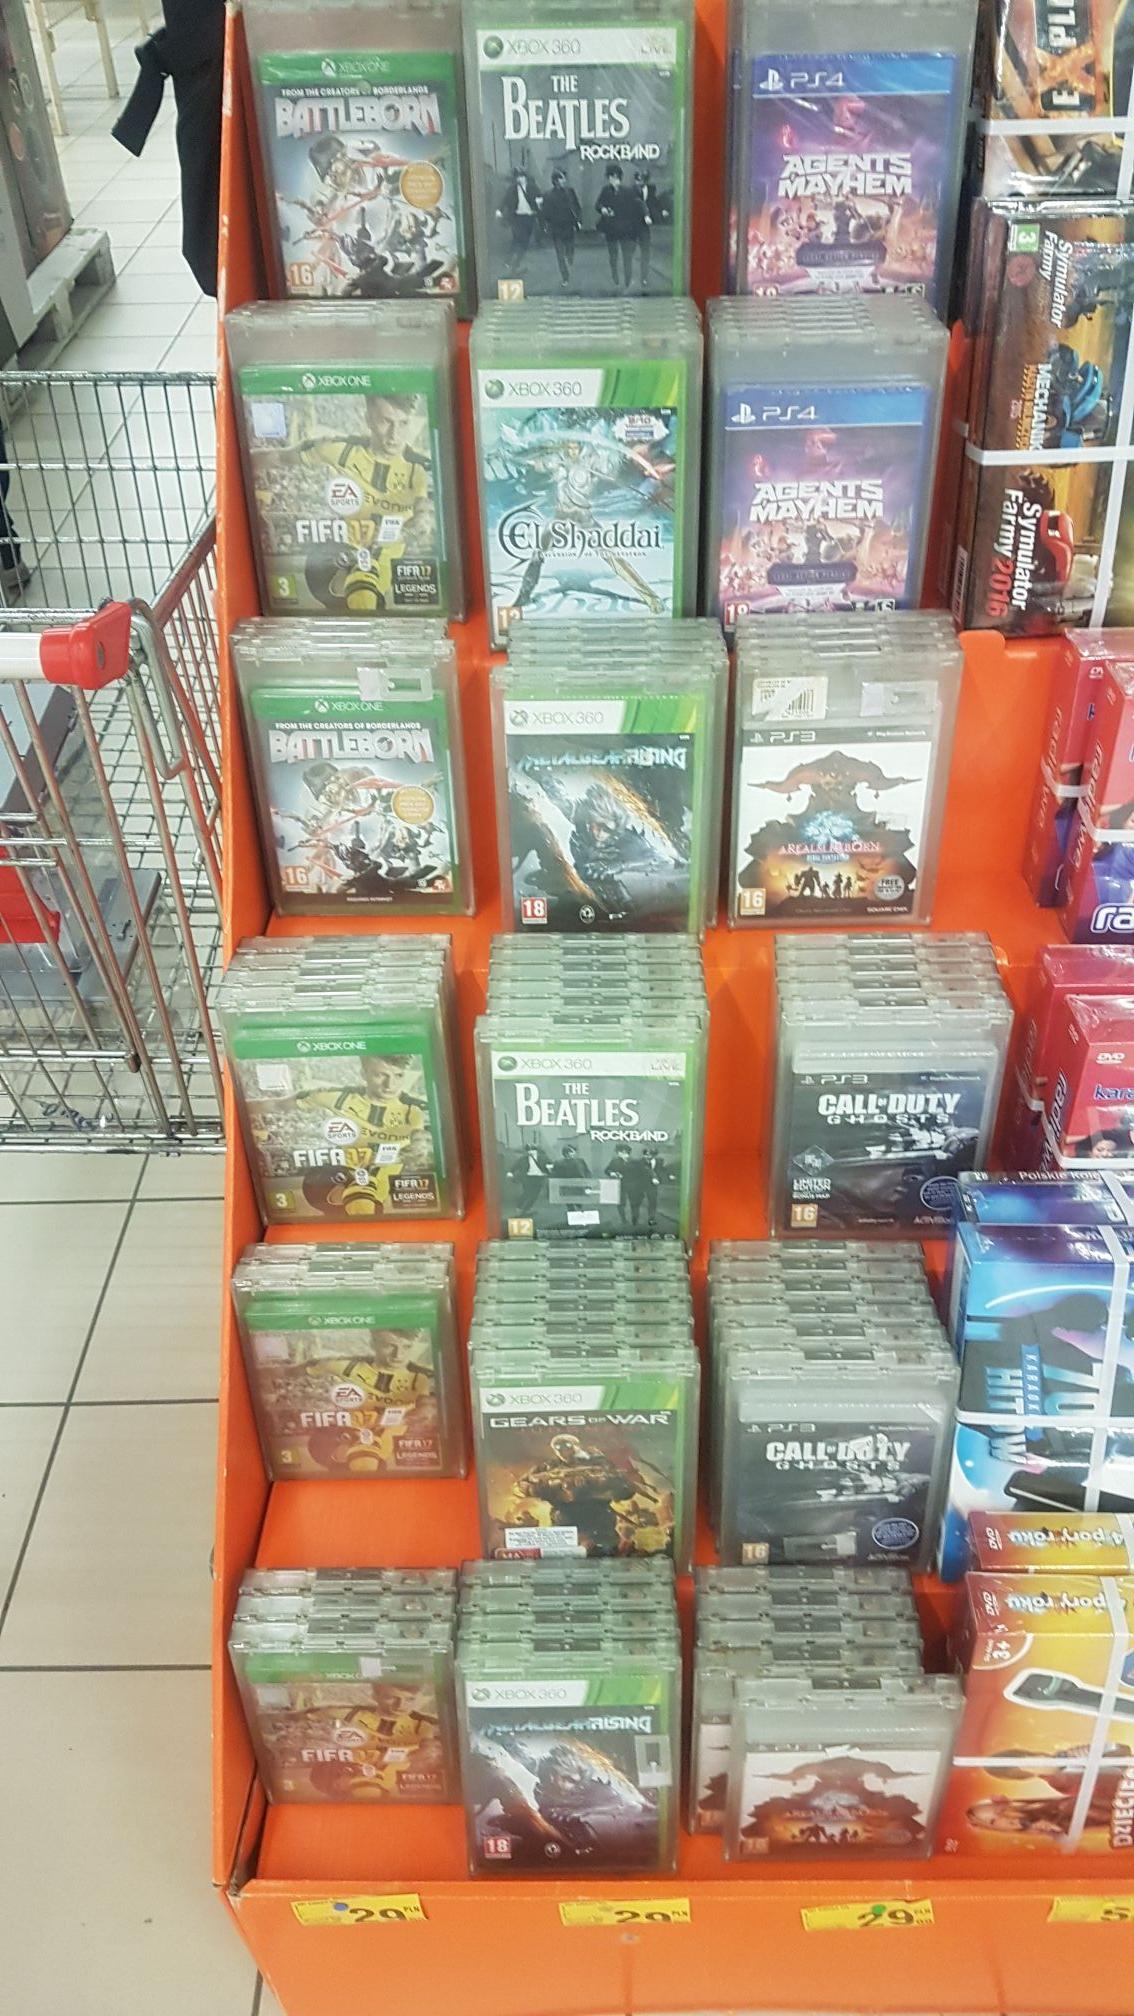 Battleborn, FIFA 17, Agents Mayhem Gry na Xbox One PS4 PS3 X360 @Auchan Bielany Wrocławskie